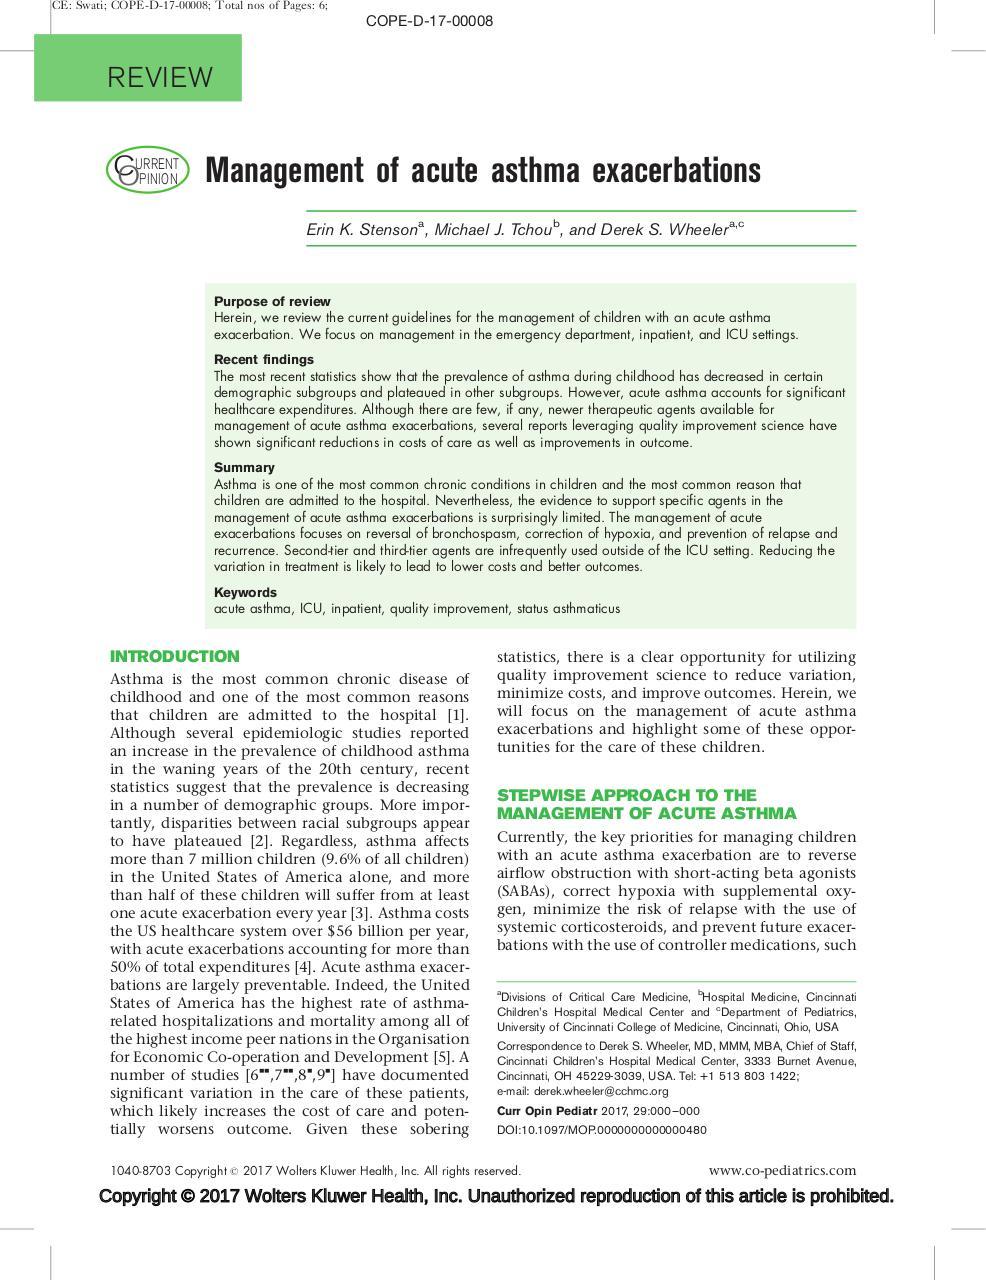 Thomson - Management of acute asthma exacerbations pdf